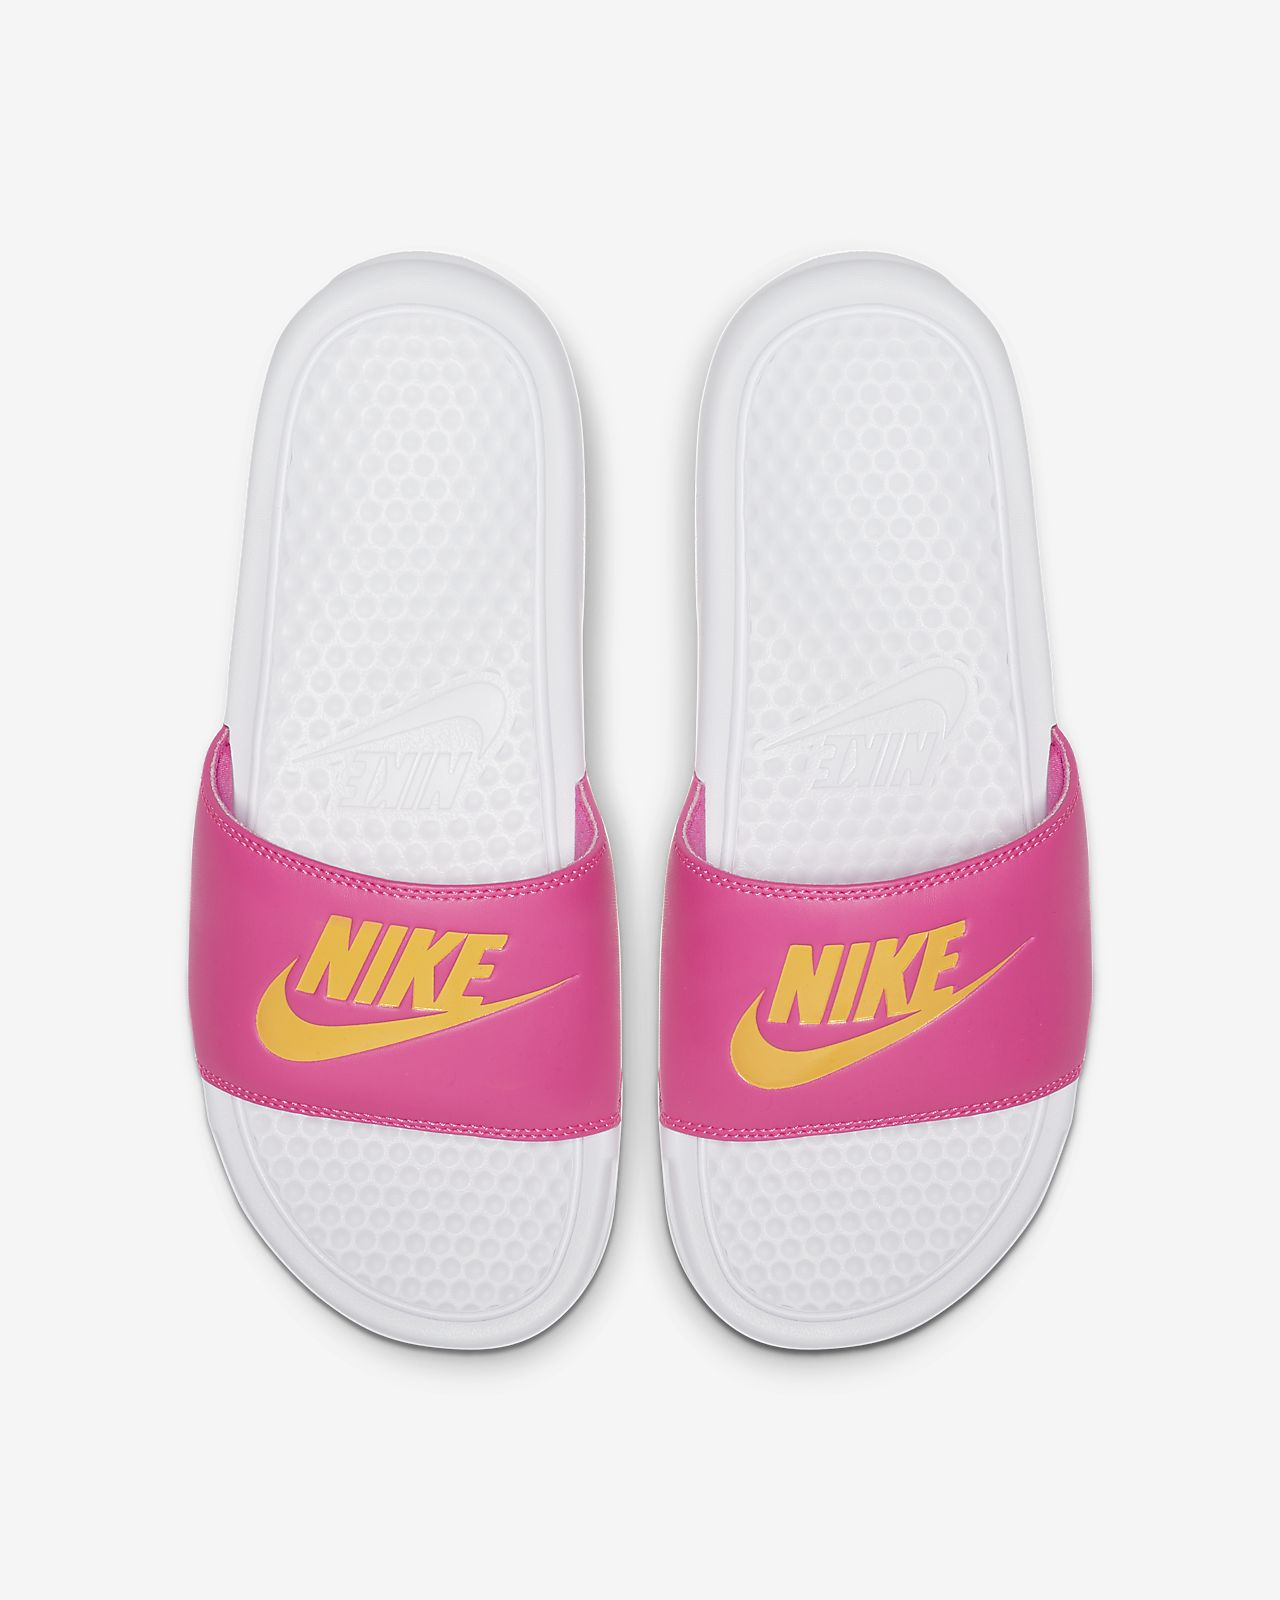 separation shoes 6a5d2 68b91 Nike Benassi Women s Slide. Nike.com LU